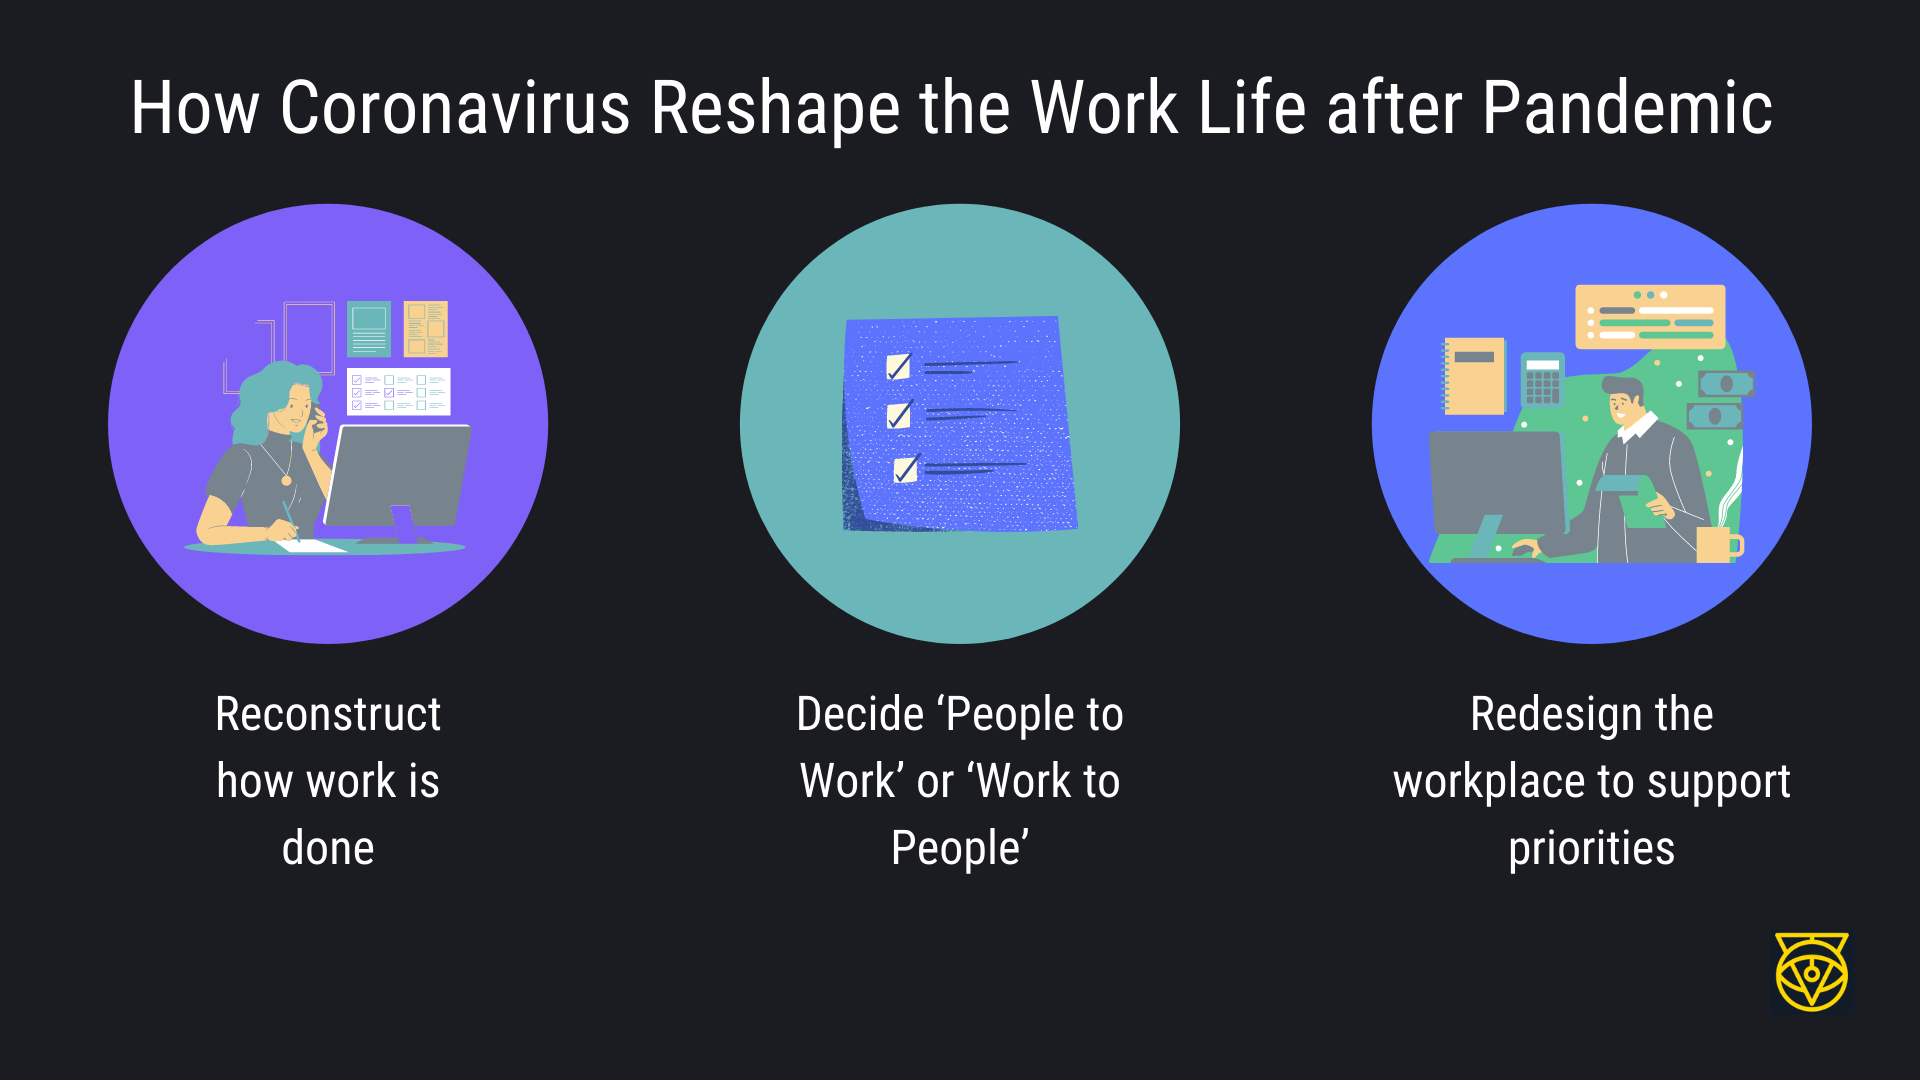 How Coronavirus Reshape the Work Life after Pandemic